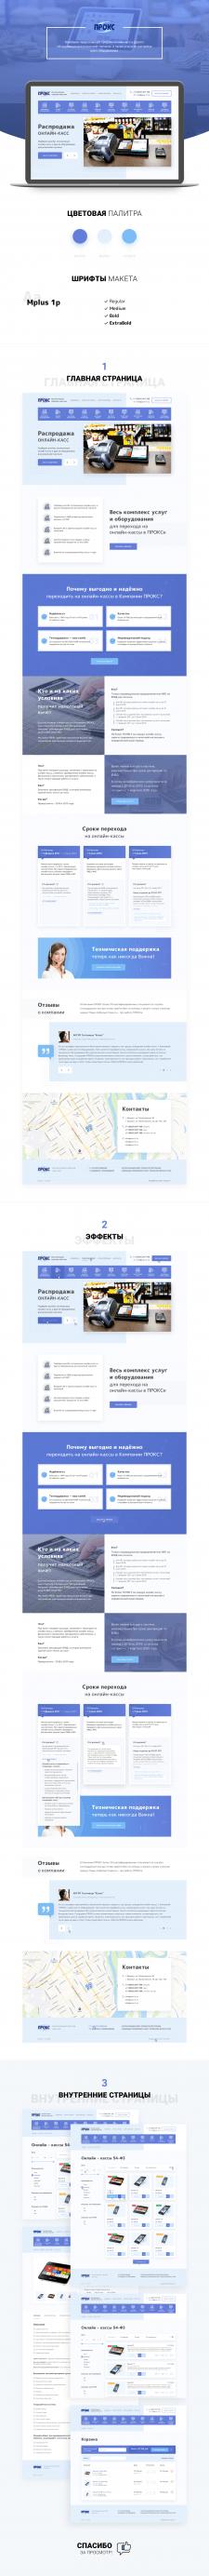 Дизайн сайта Касса 22